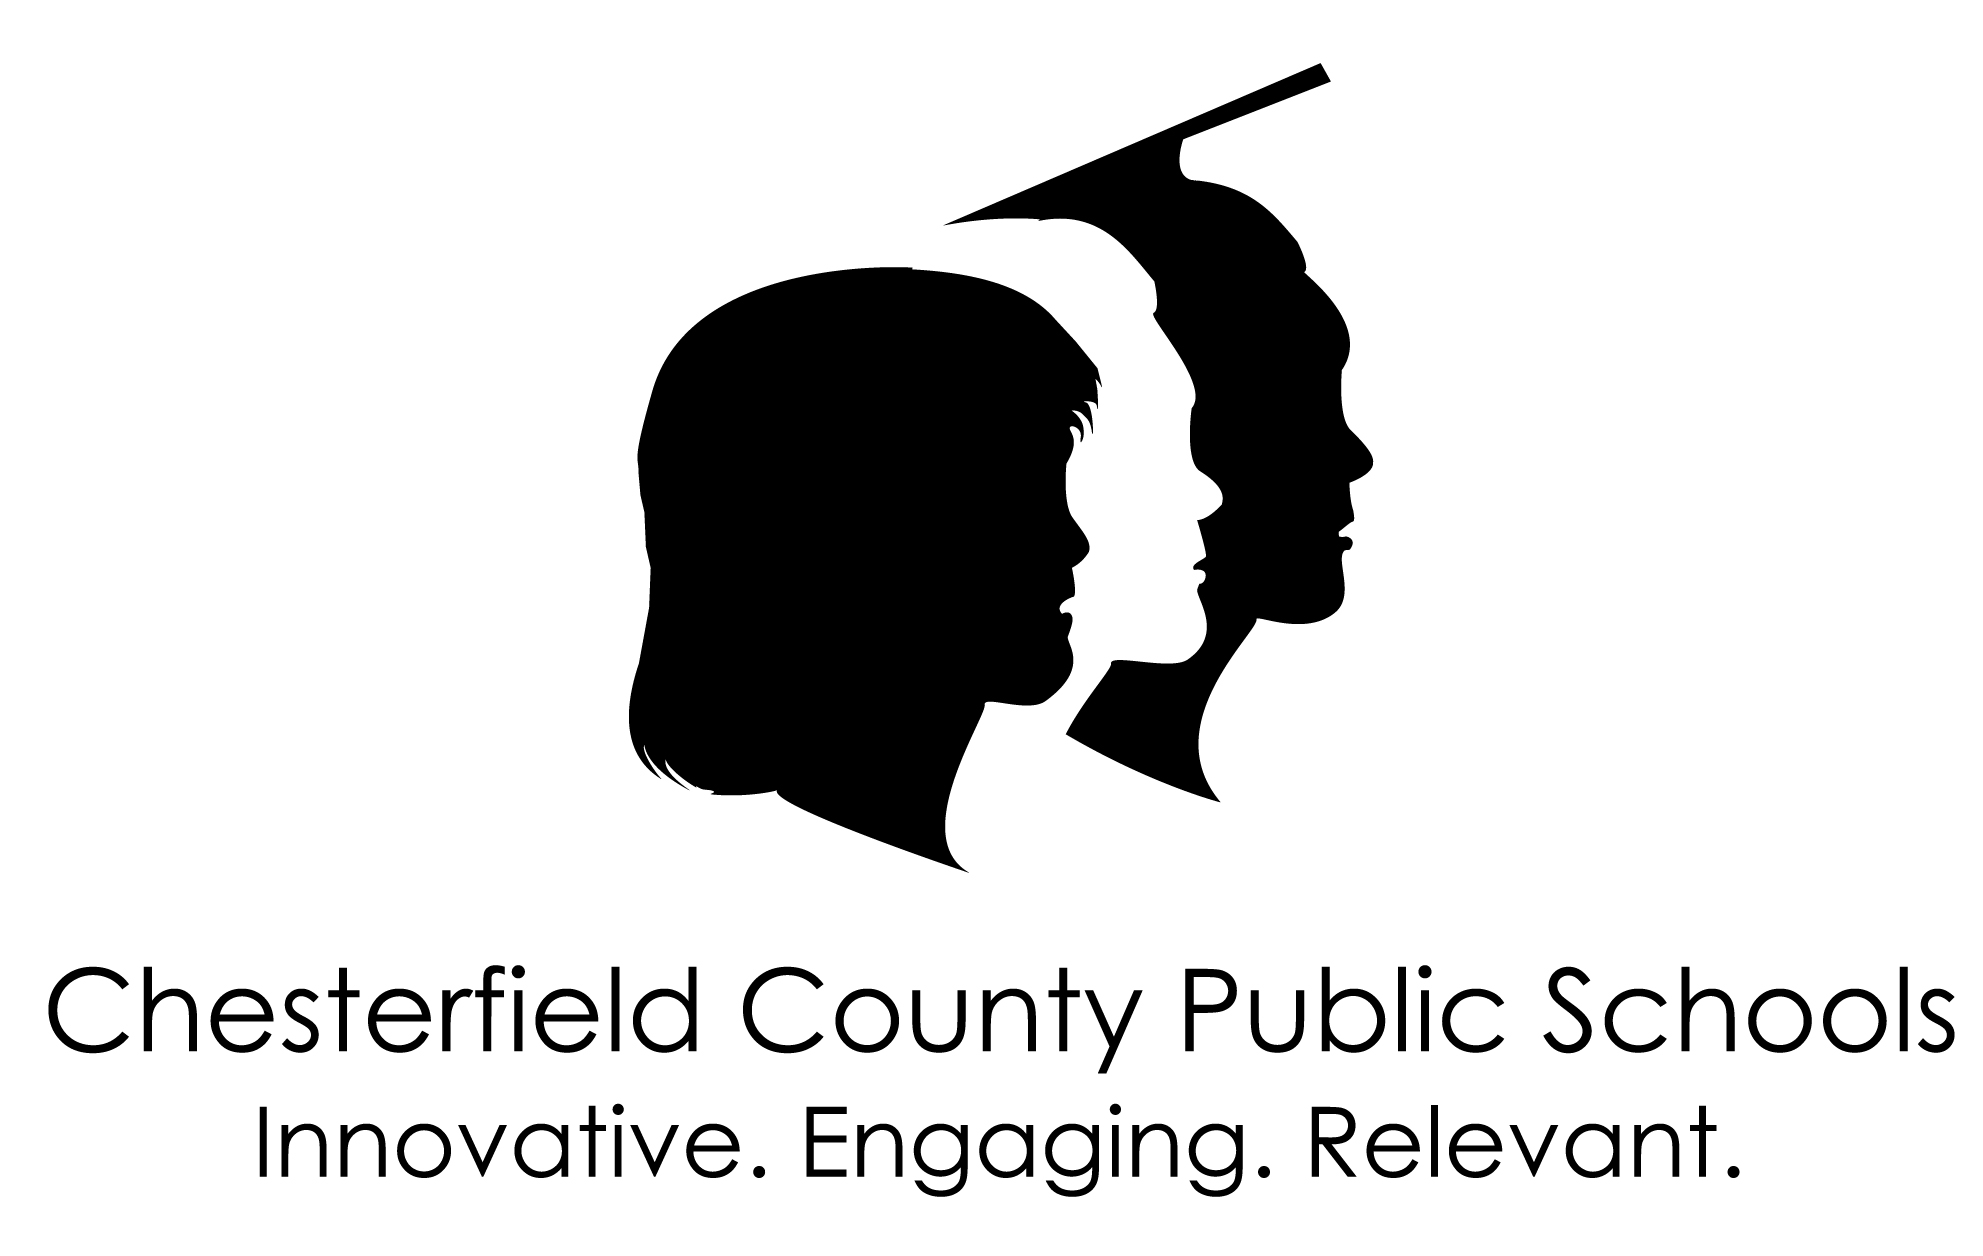 Chesterfield County Public Schools Logo